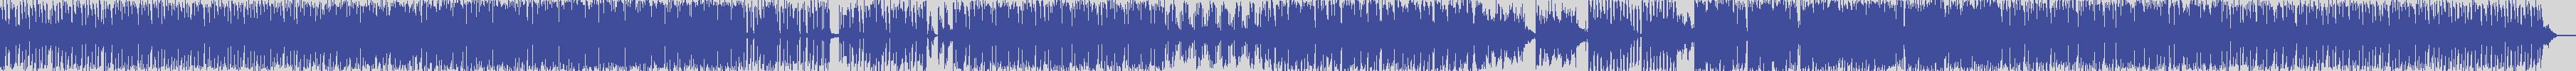 just_digital_records [JS1143] Homeboyz - Future [Djrobber Mix] audio wave form